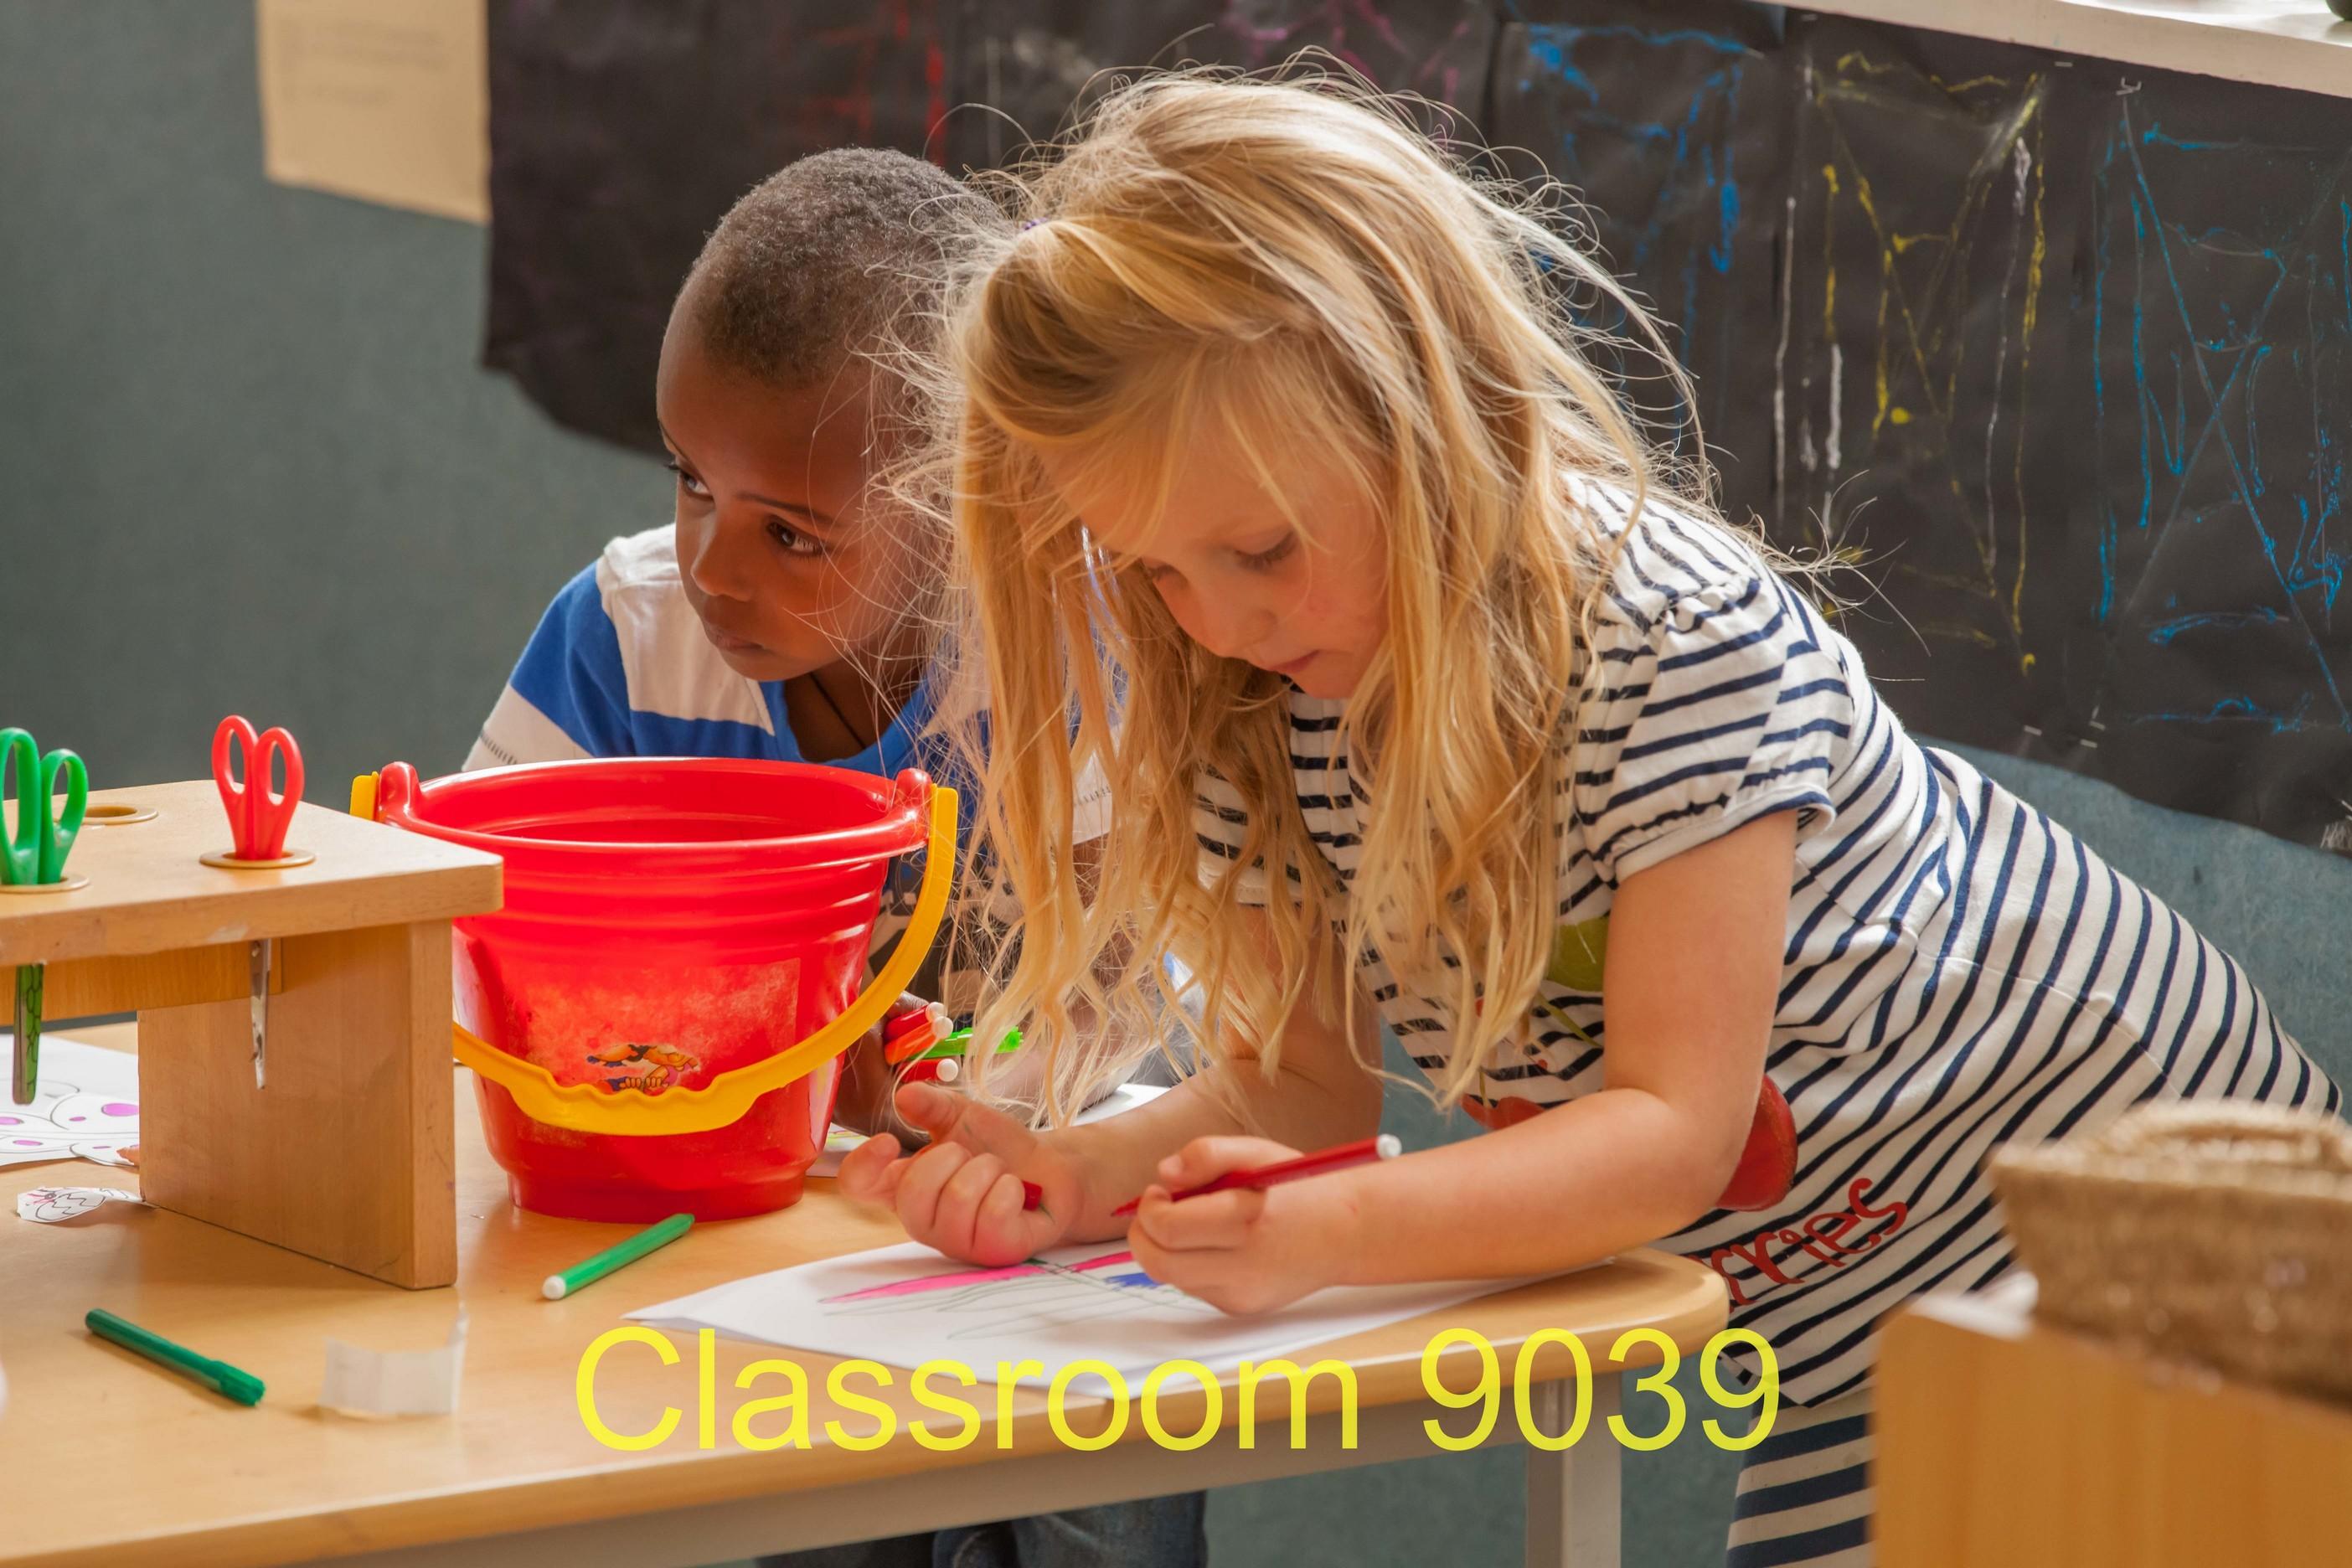 Classroom 9039